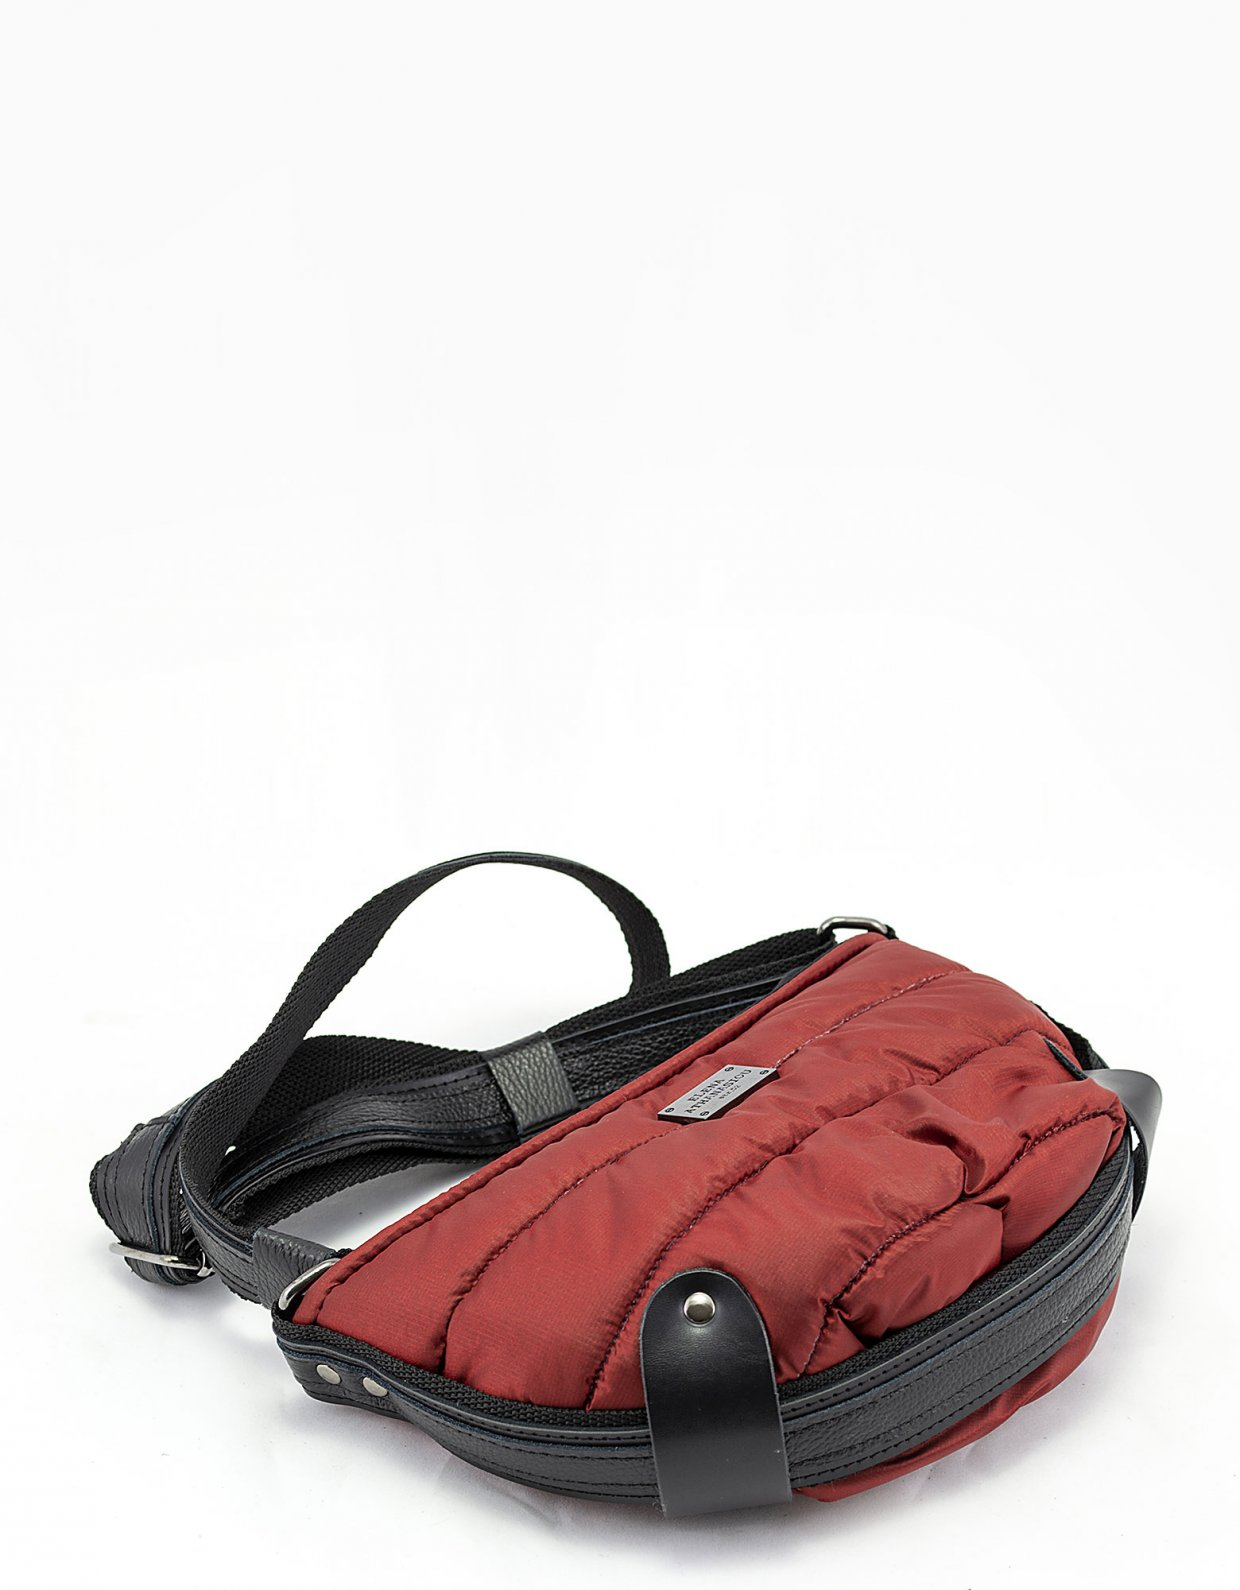 Elena Athanasiou Puffer body bag small brick red